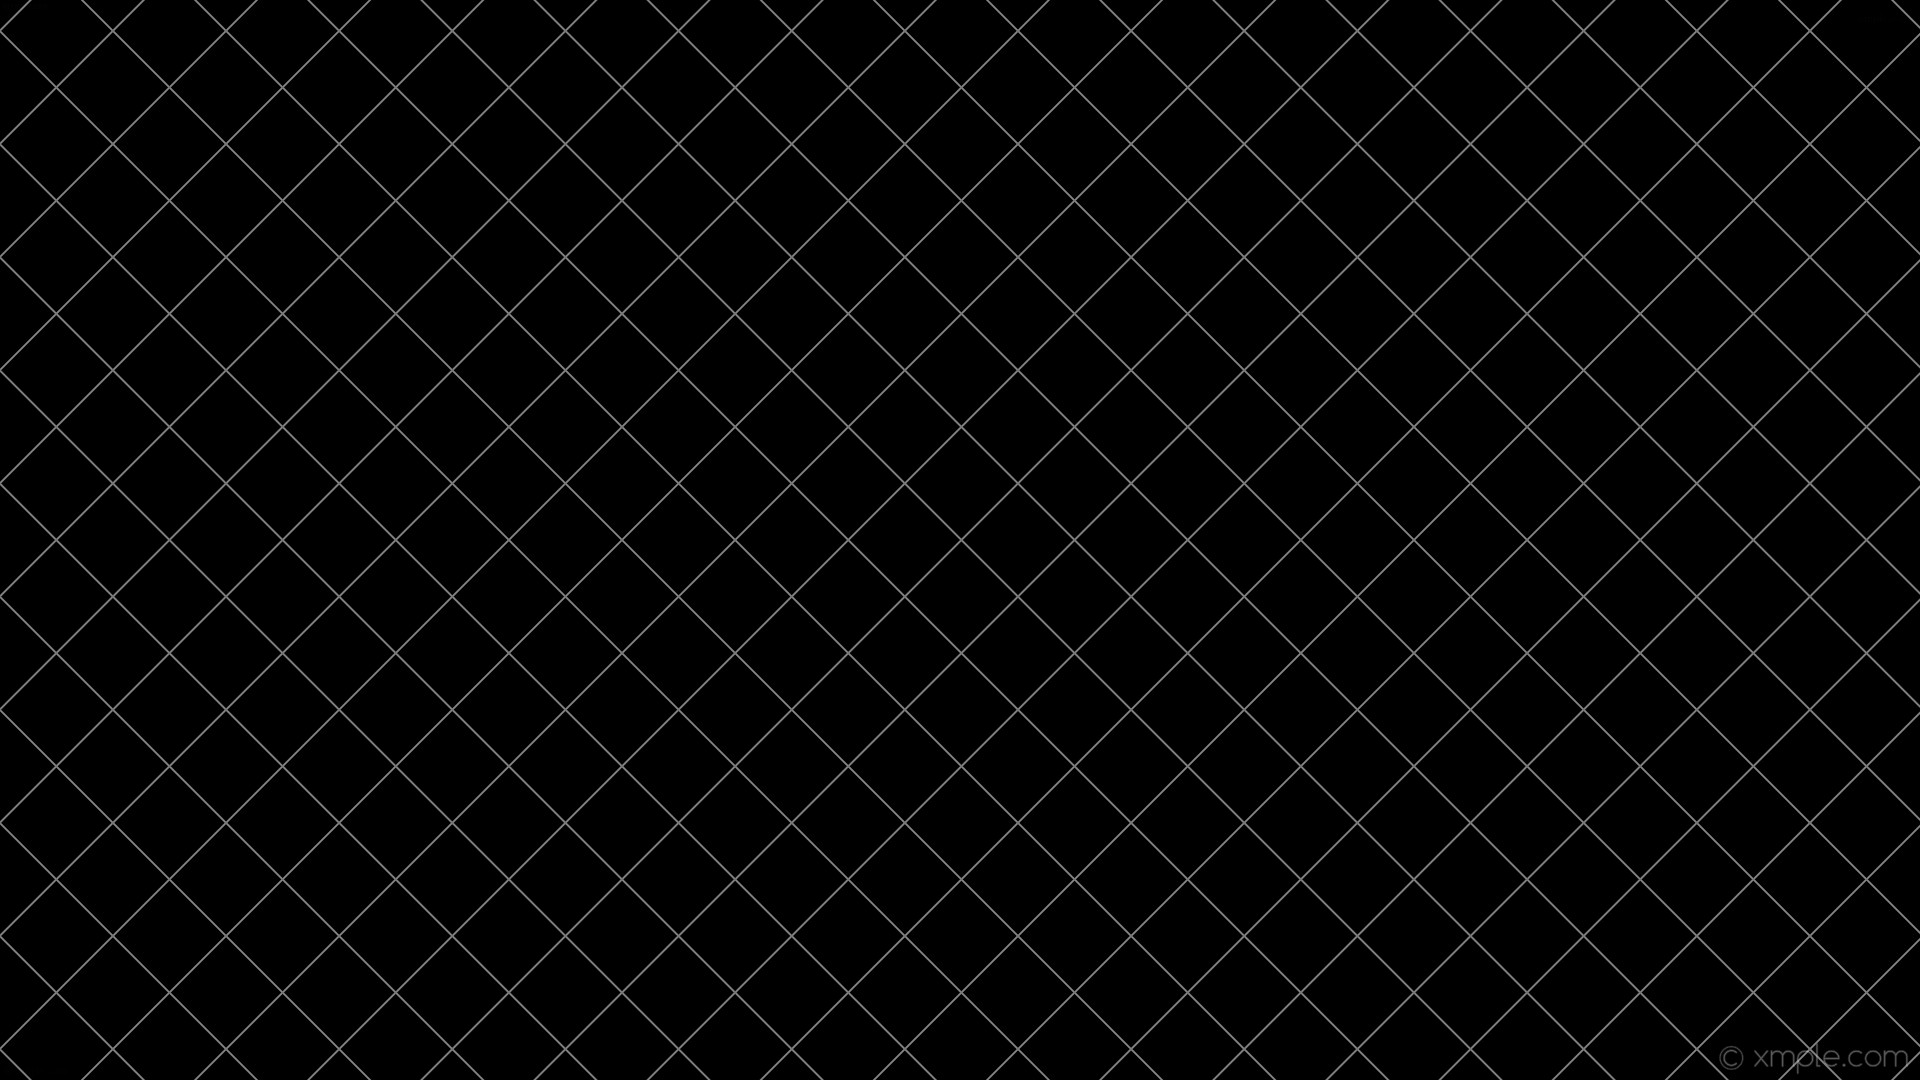 wallpaper graph paper black grey grid dark gray #000000 #a9a9a9 45° 2px 80px